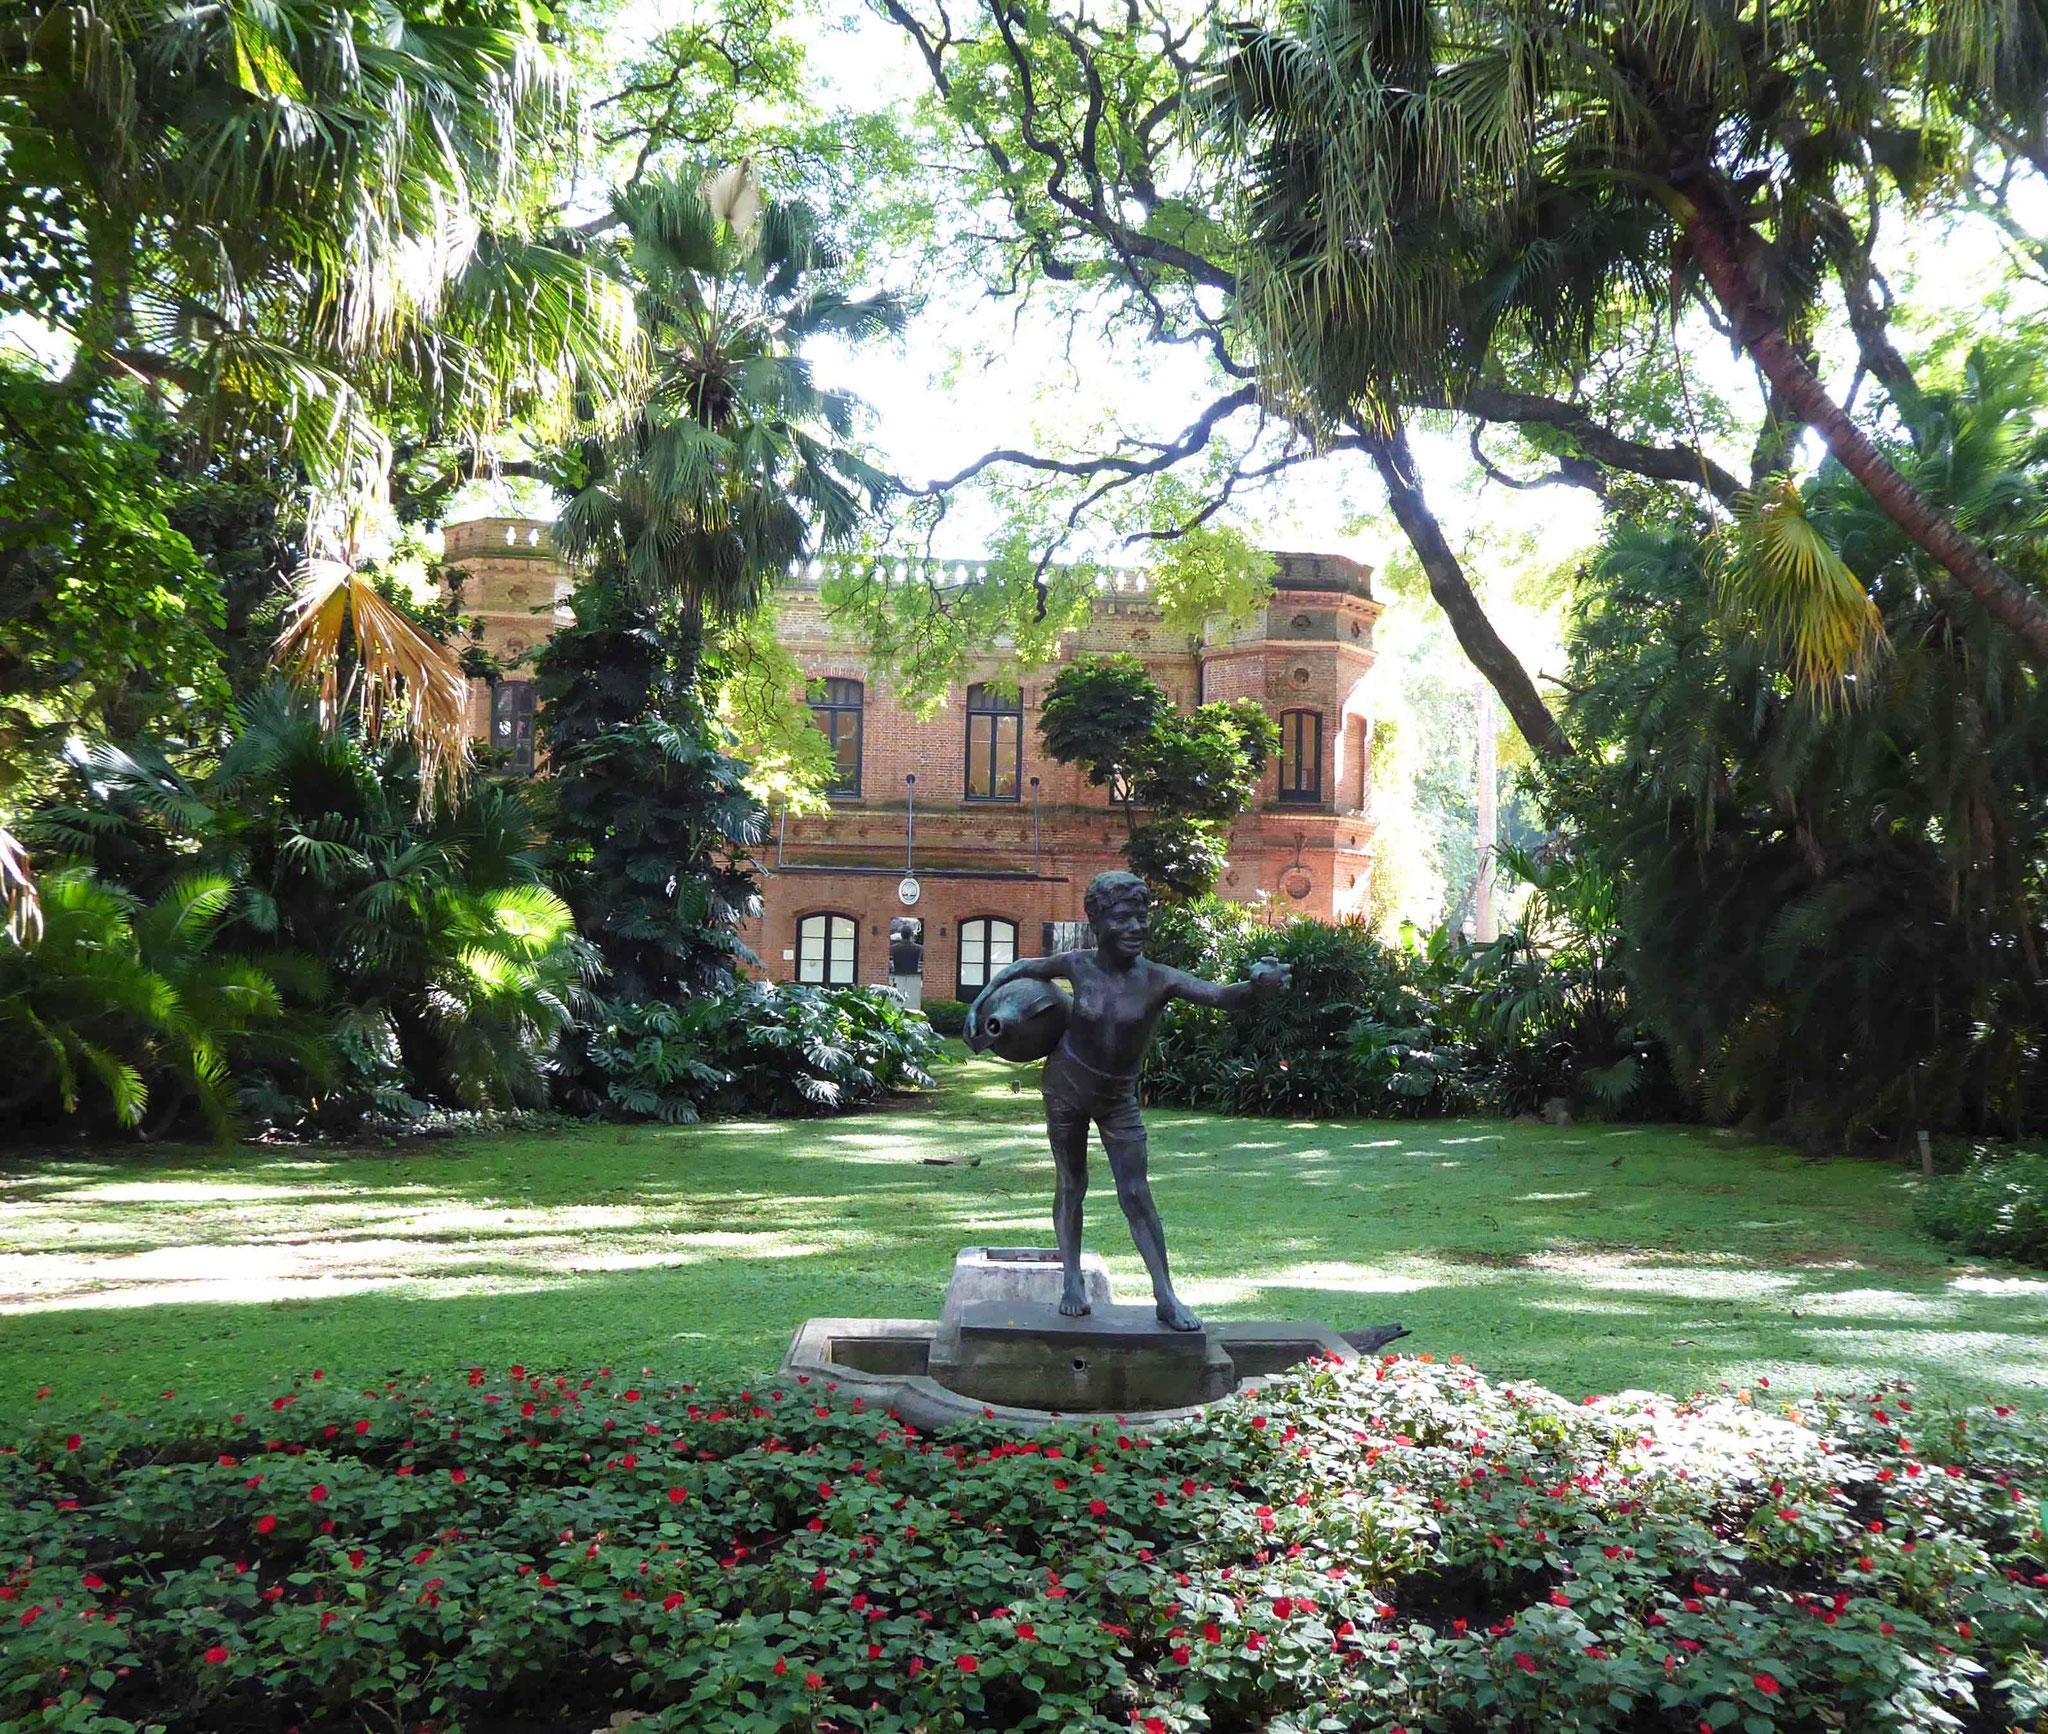 Jardin botanique Carlos Thays (5500 espèces de plantes sur 7 ha)